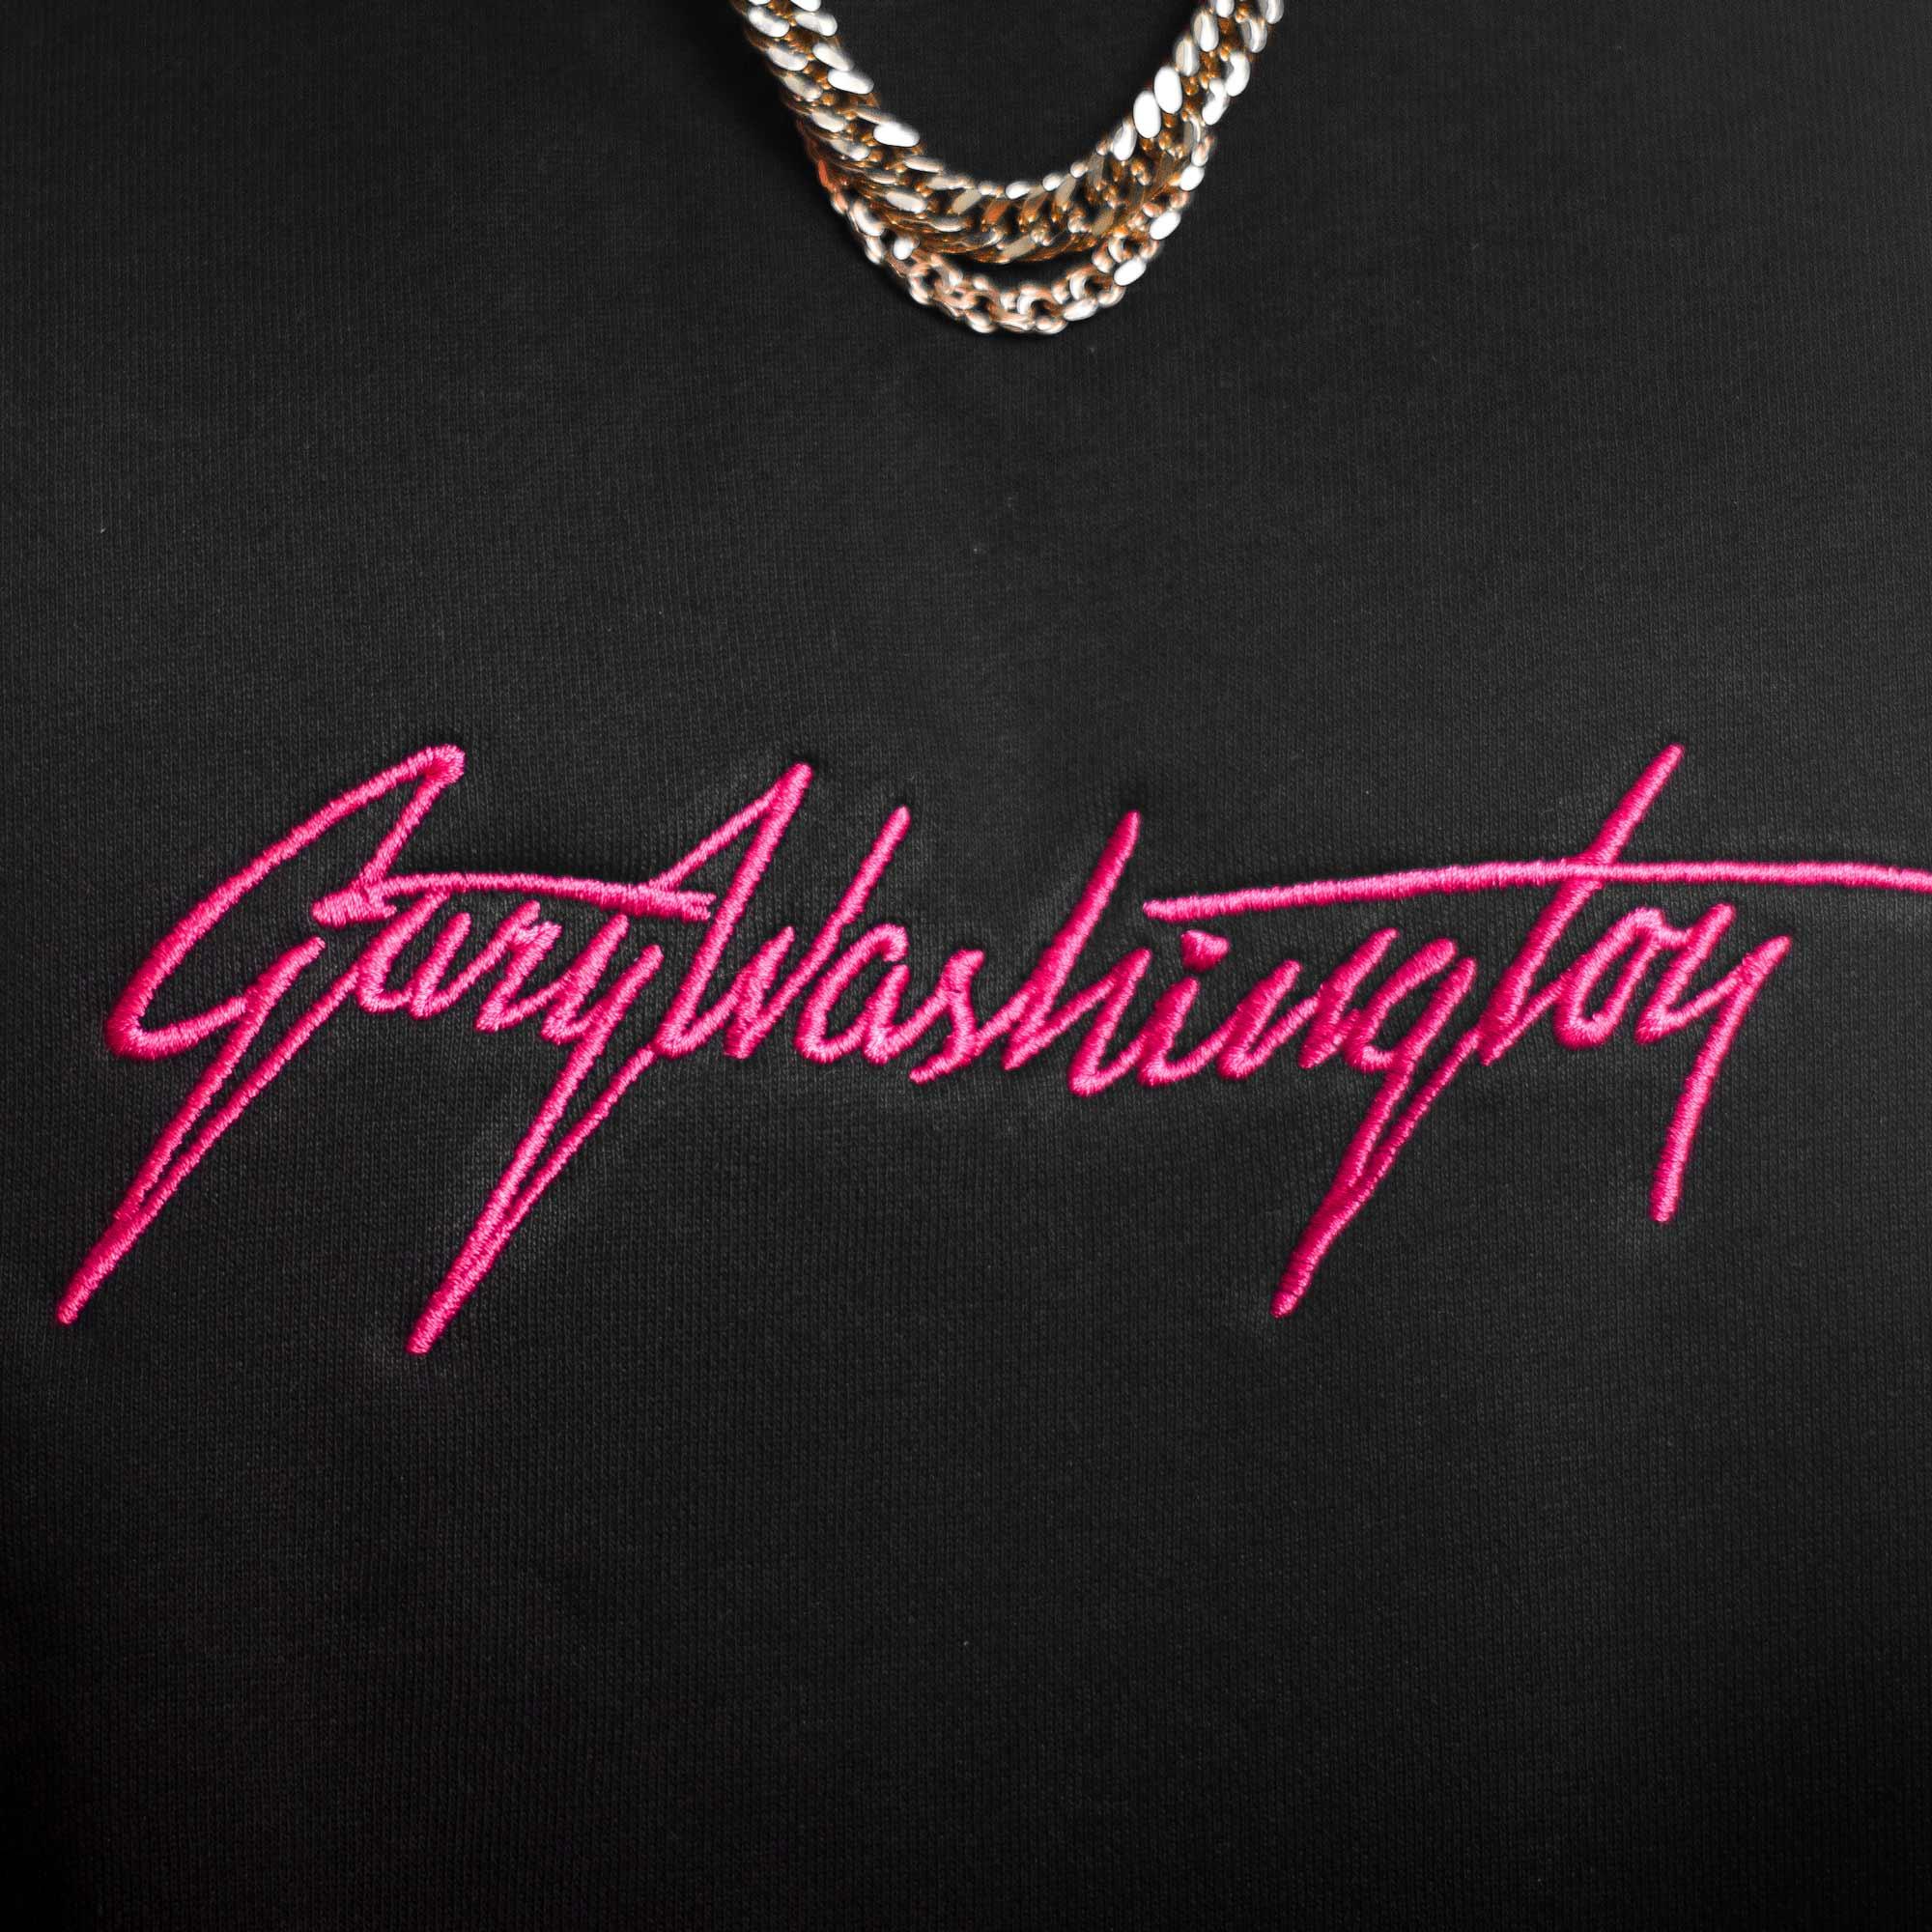 STRAWBERRY WASHINGTON - HOODIE